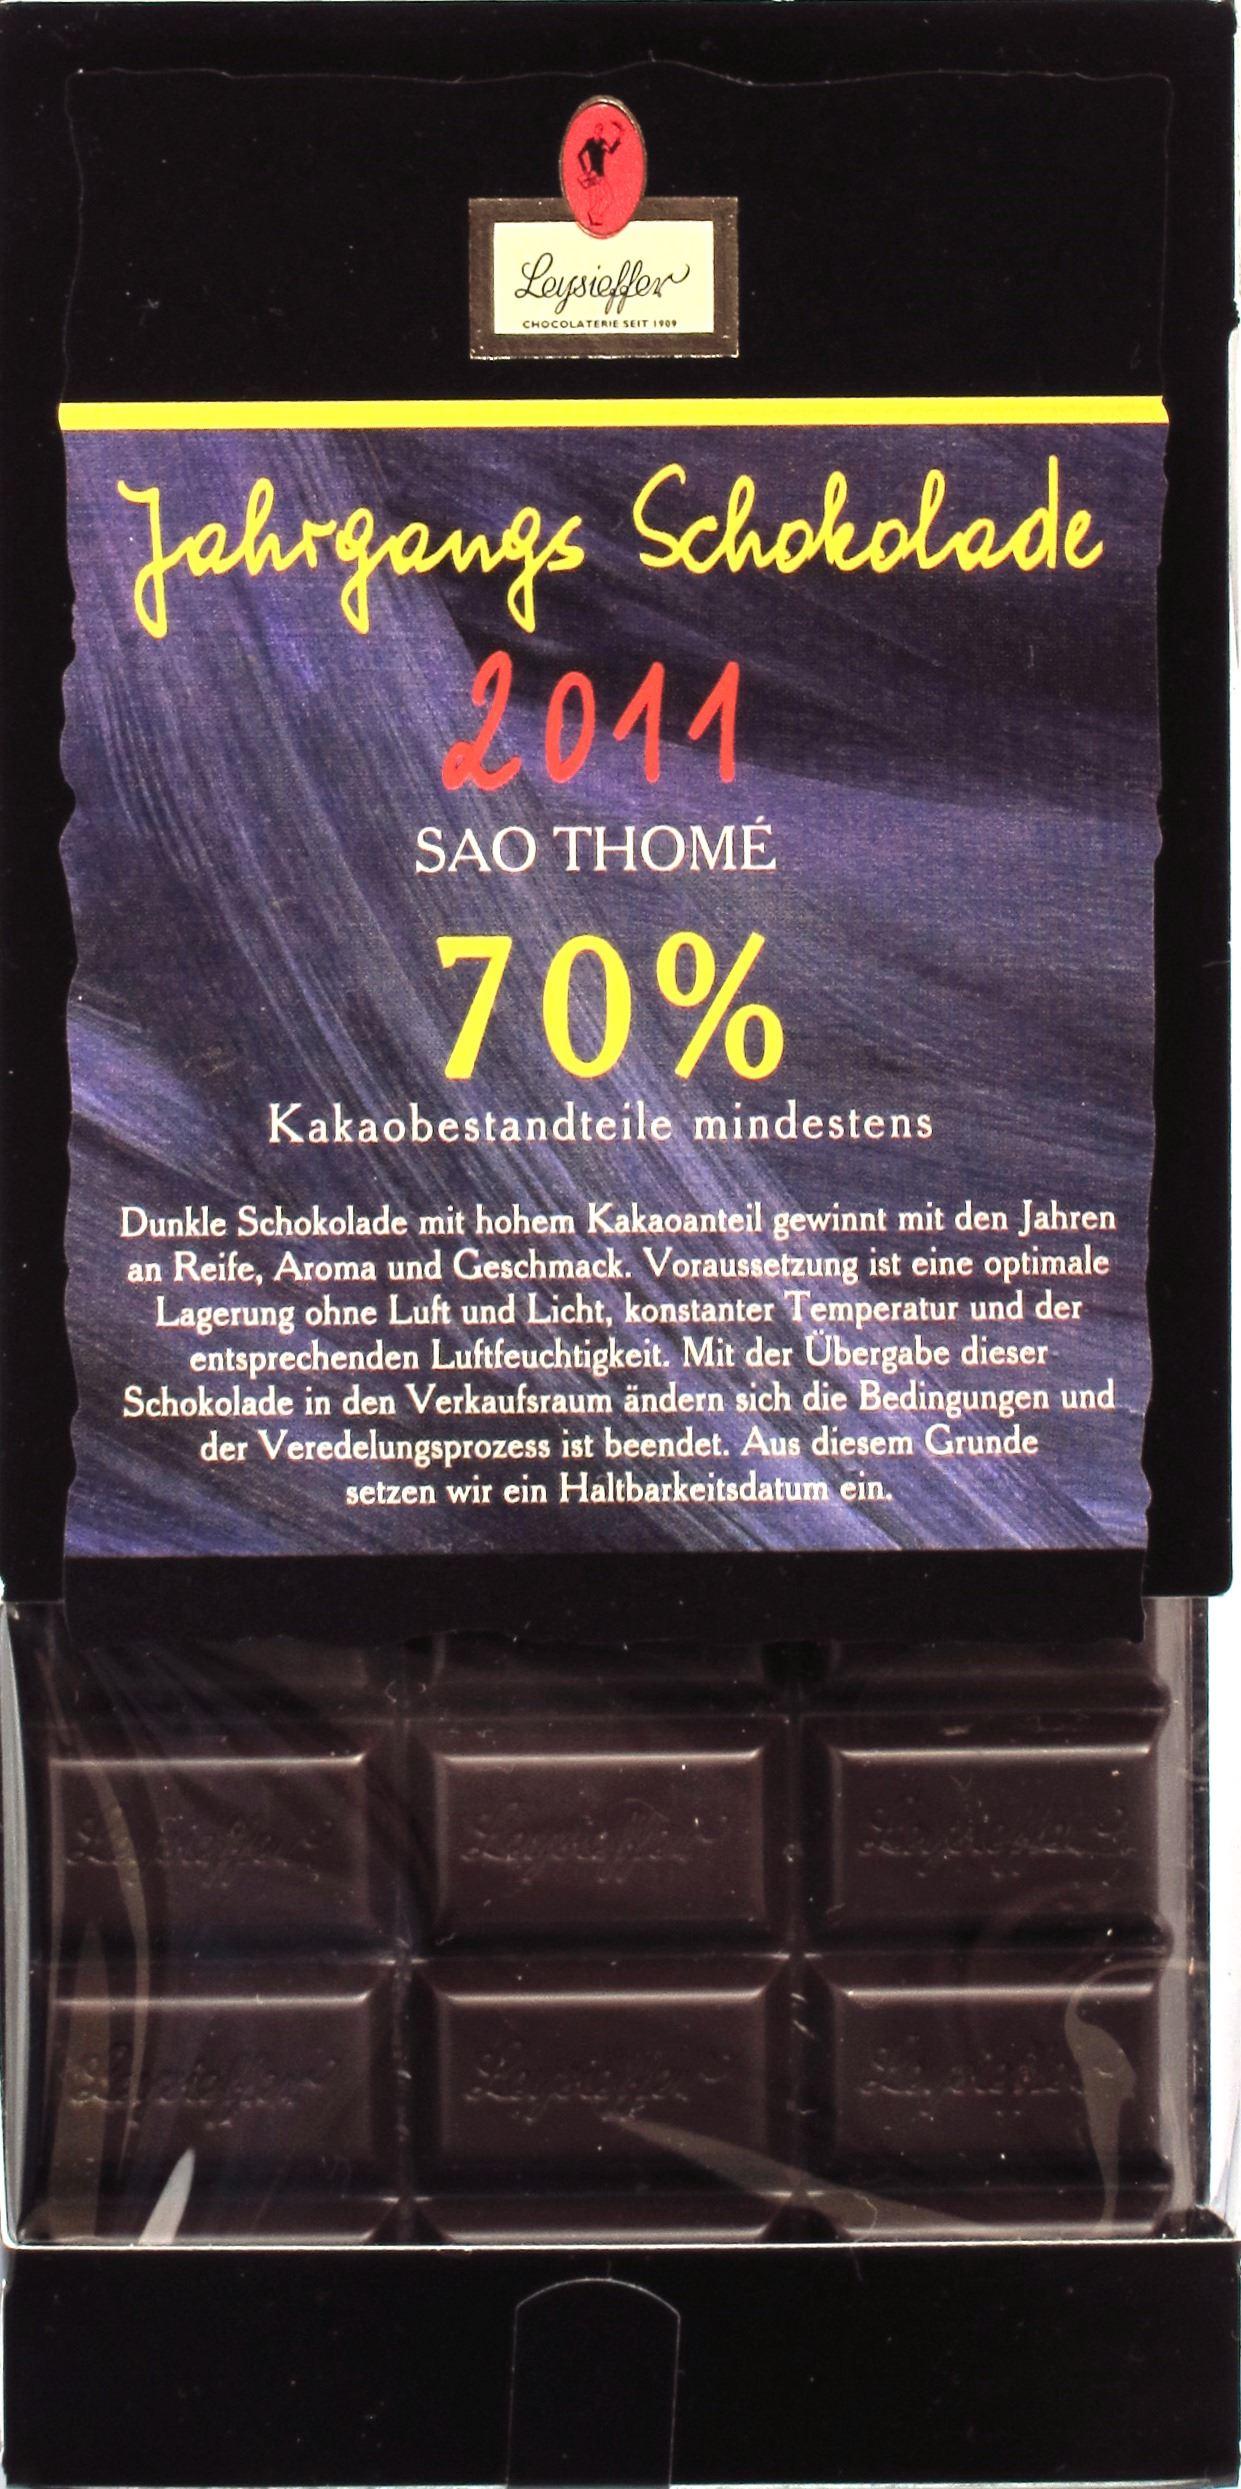 Leysieffer 2011-Jahrgangsschokolade